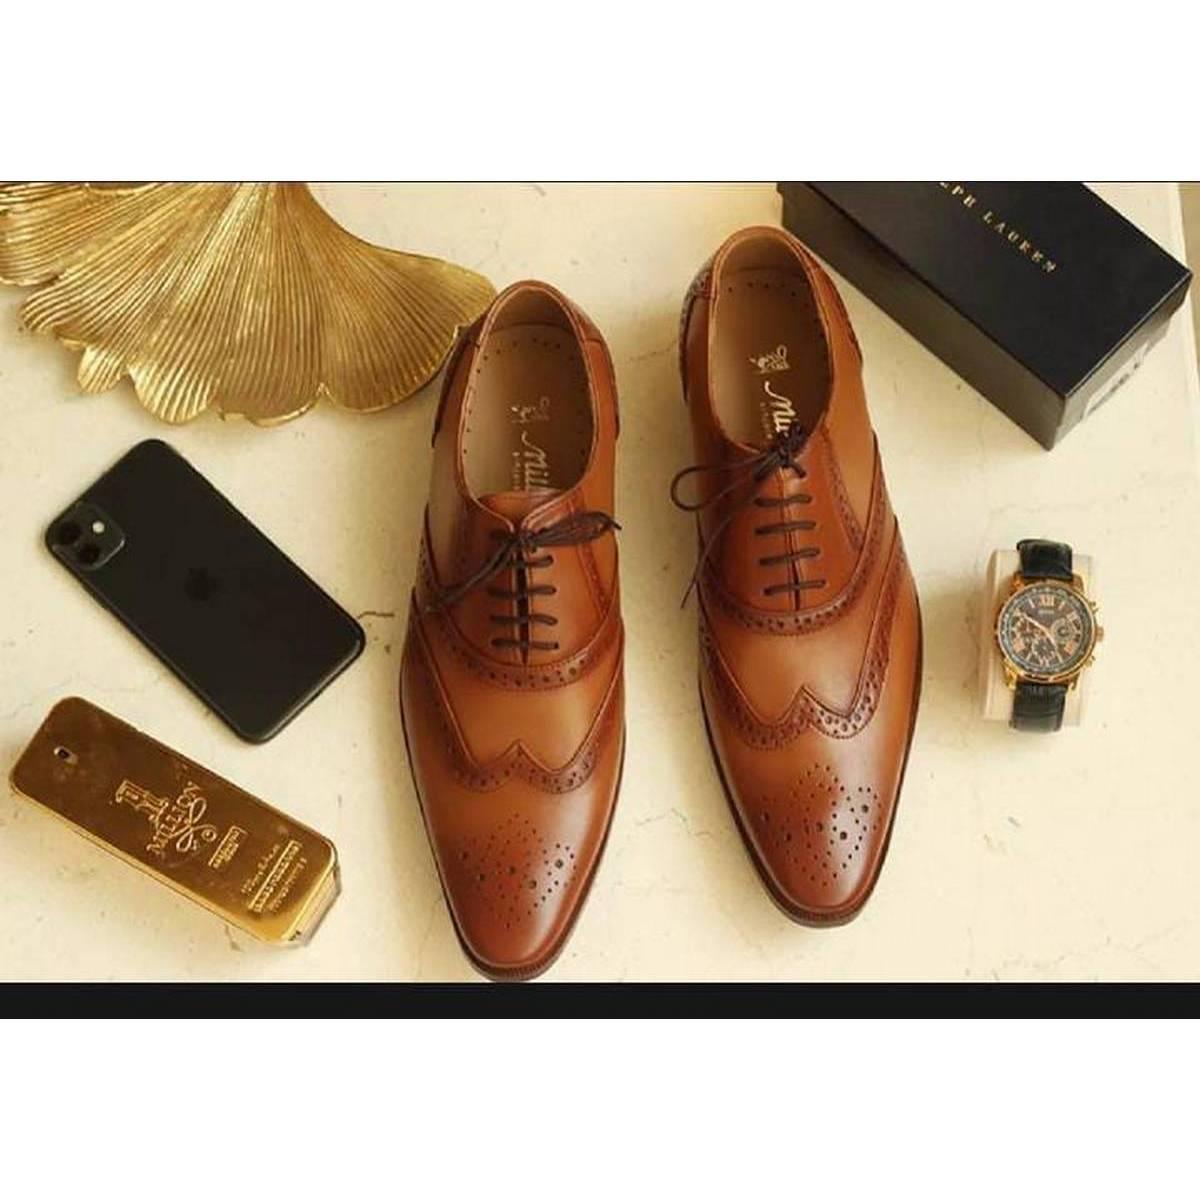 formal designer shoes only 799 stock finishing sale